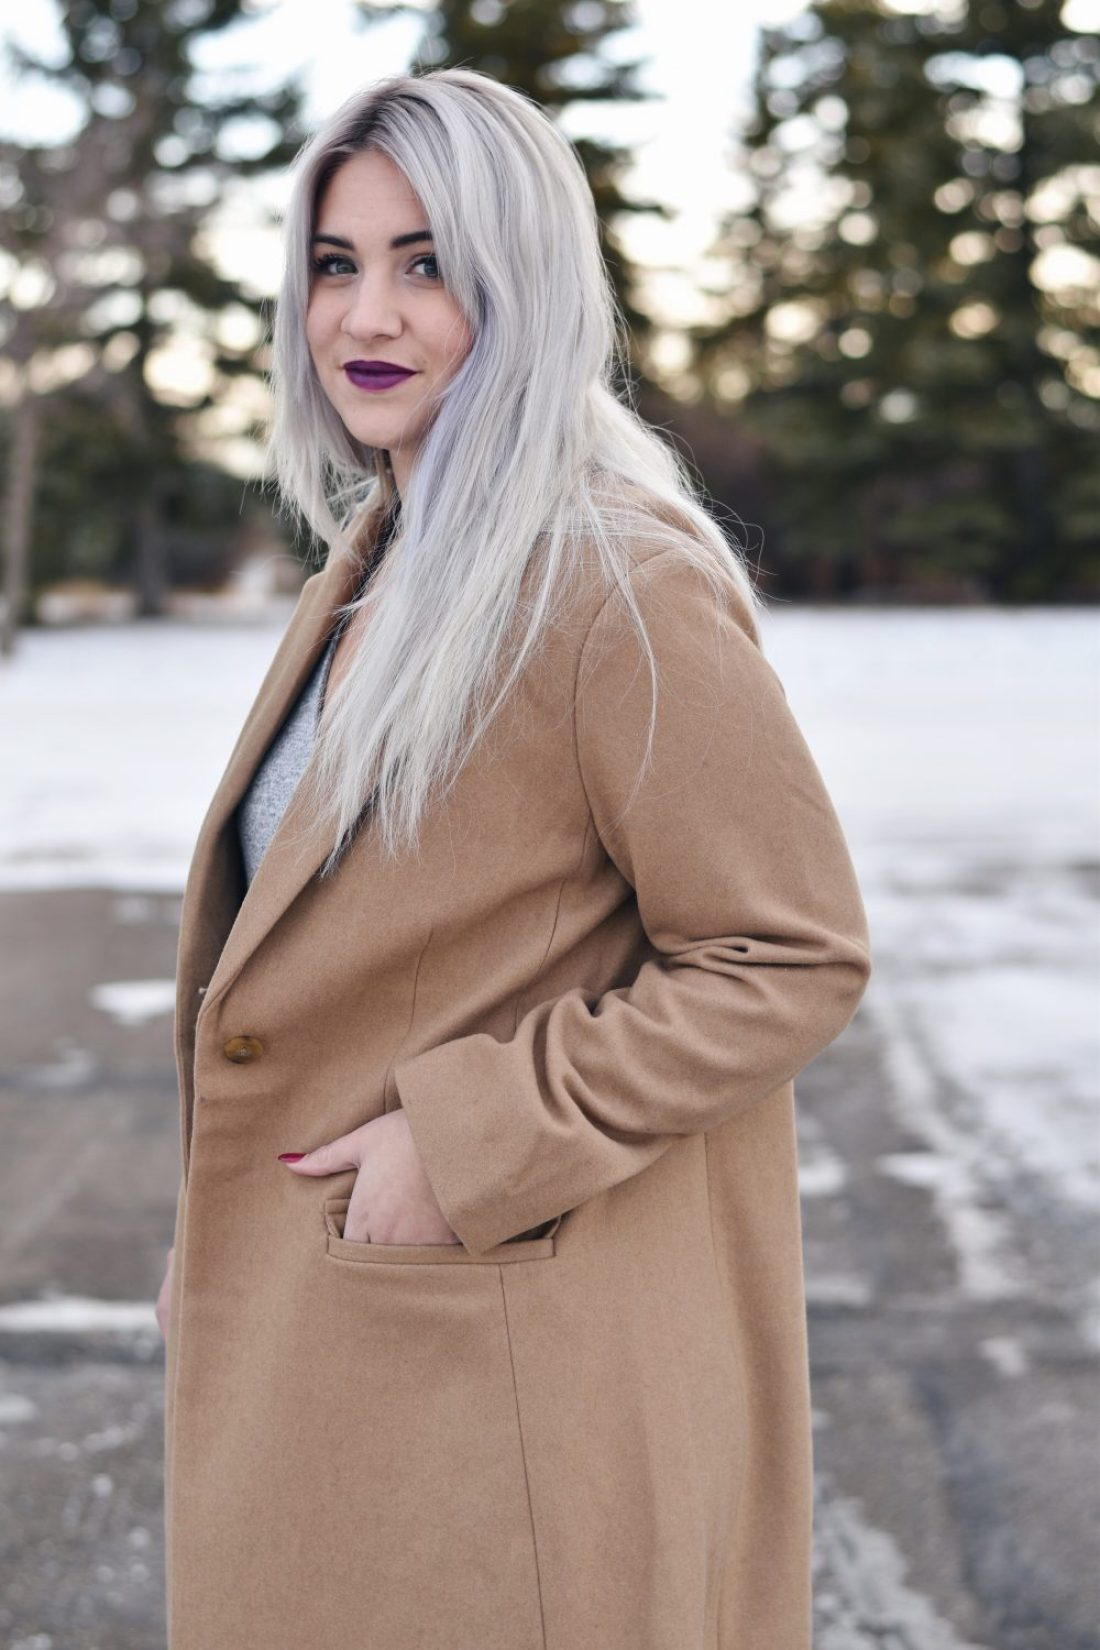 White blonde long hair